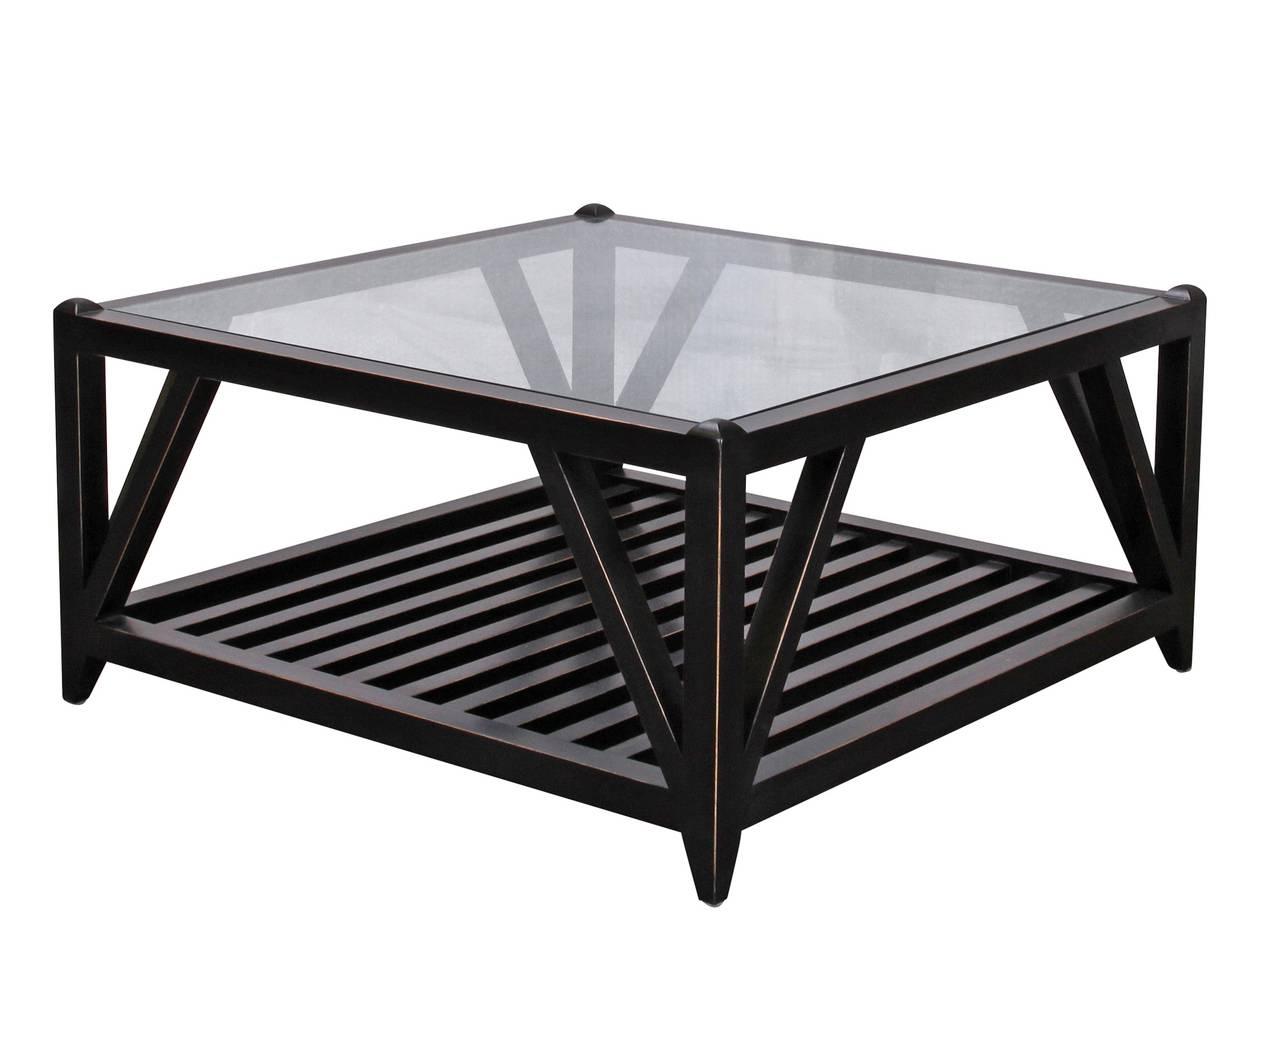 30 Photos Square Black Coffee Tables